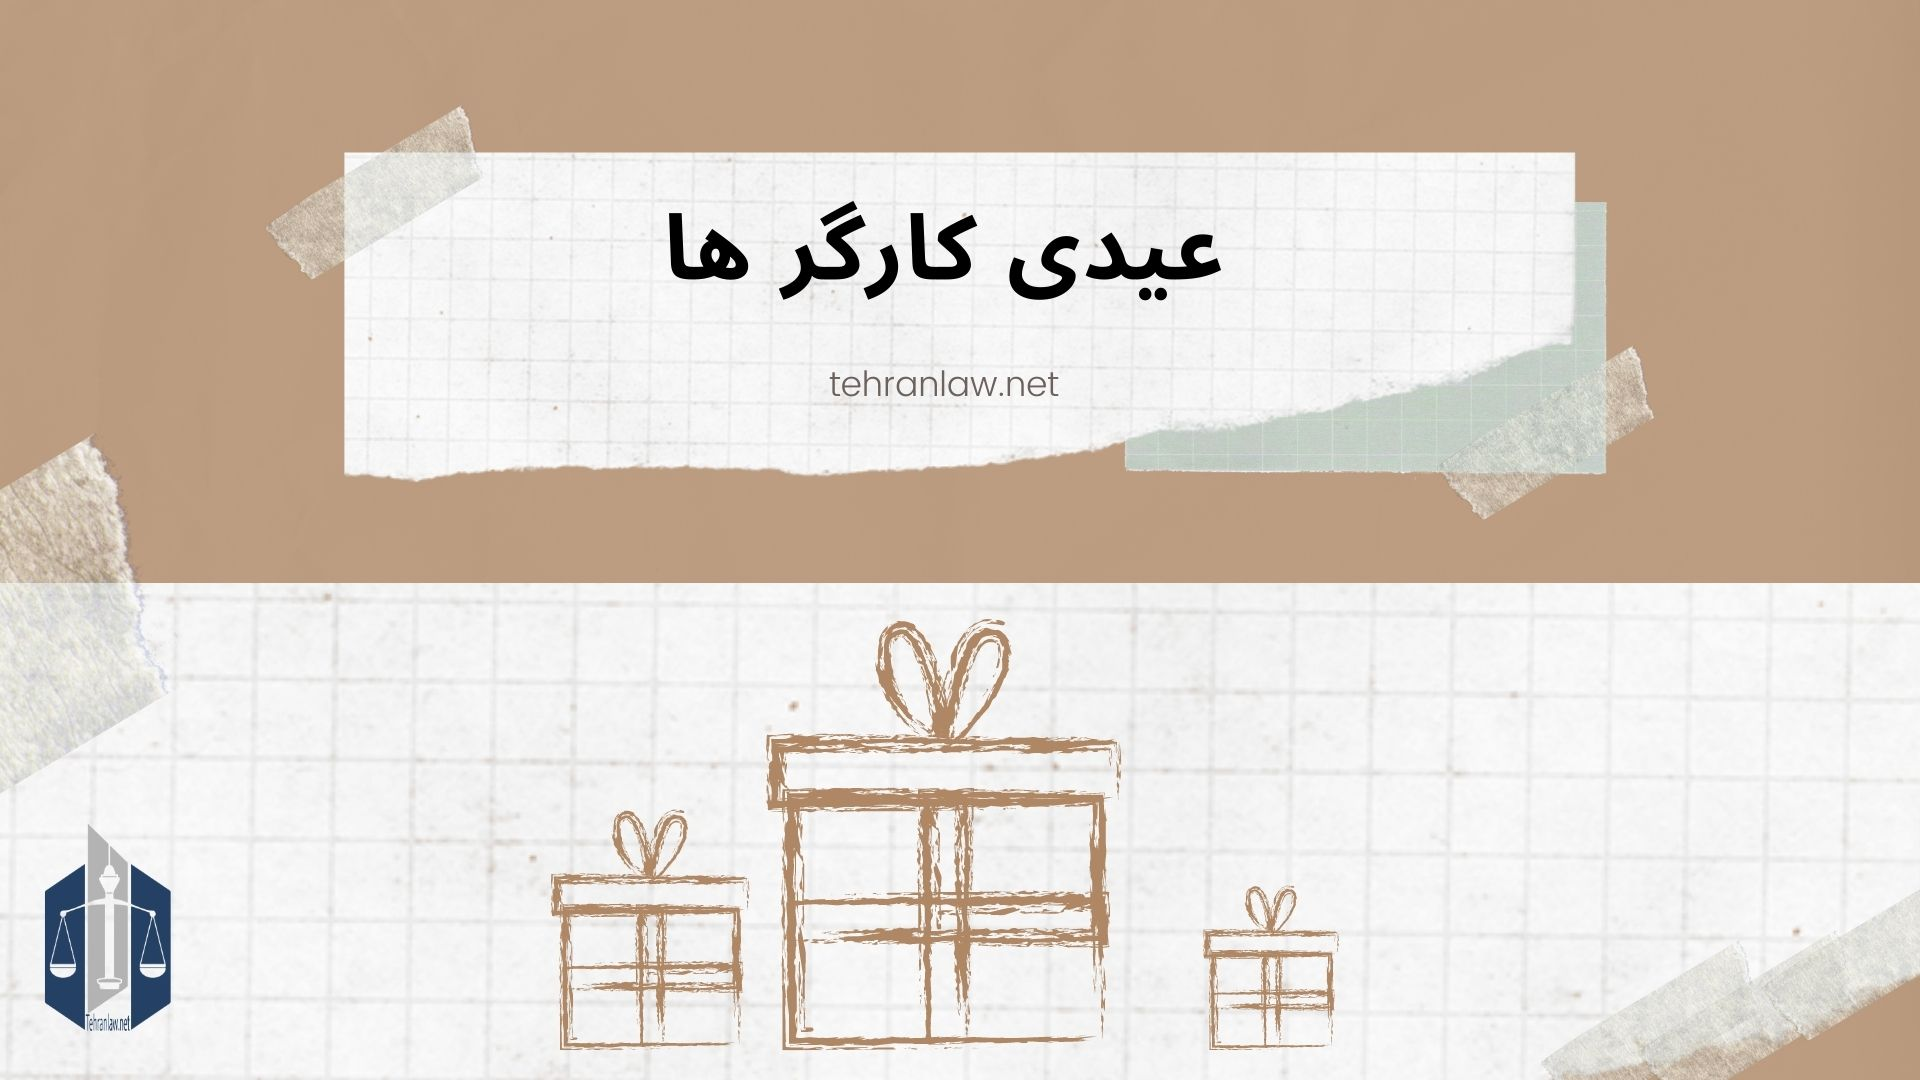 عیدی کارگر ها